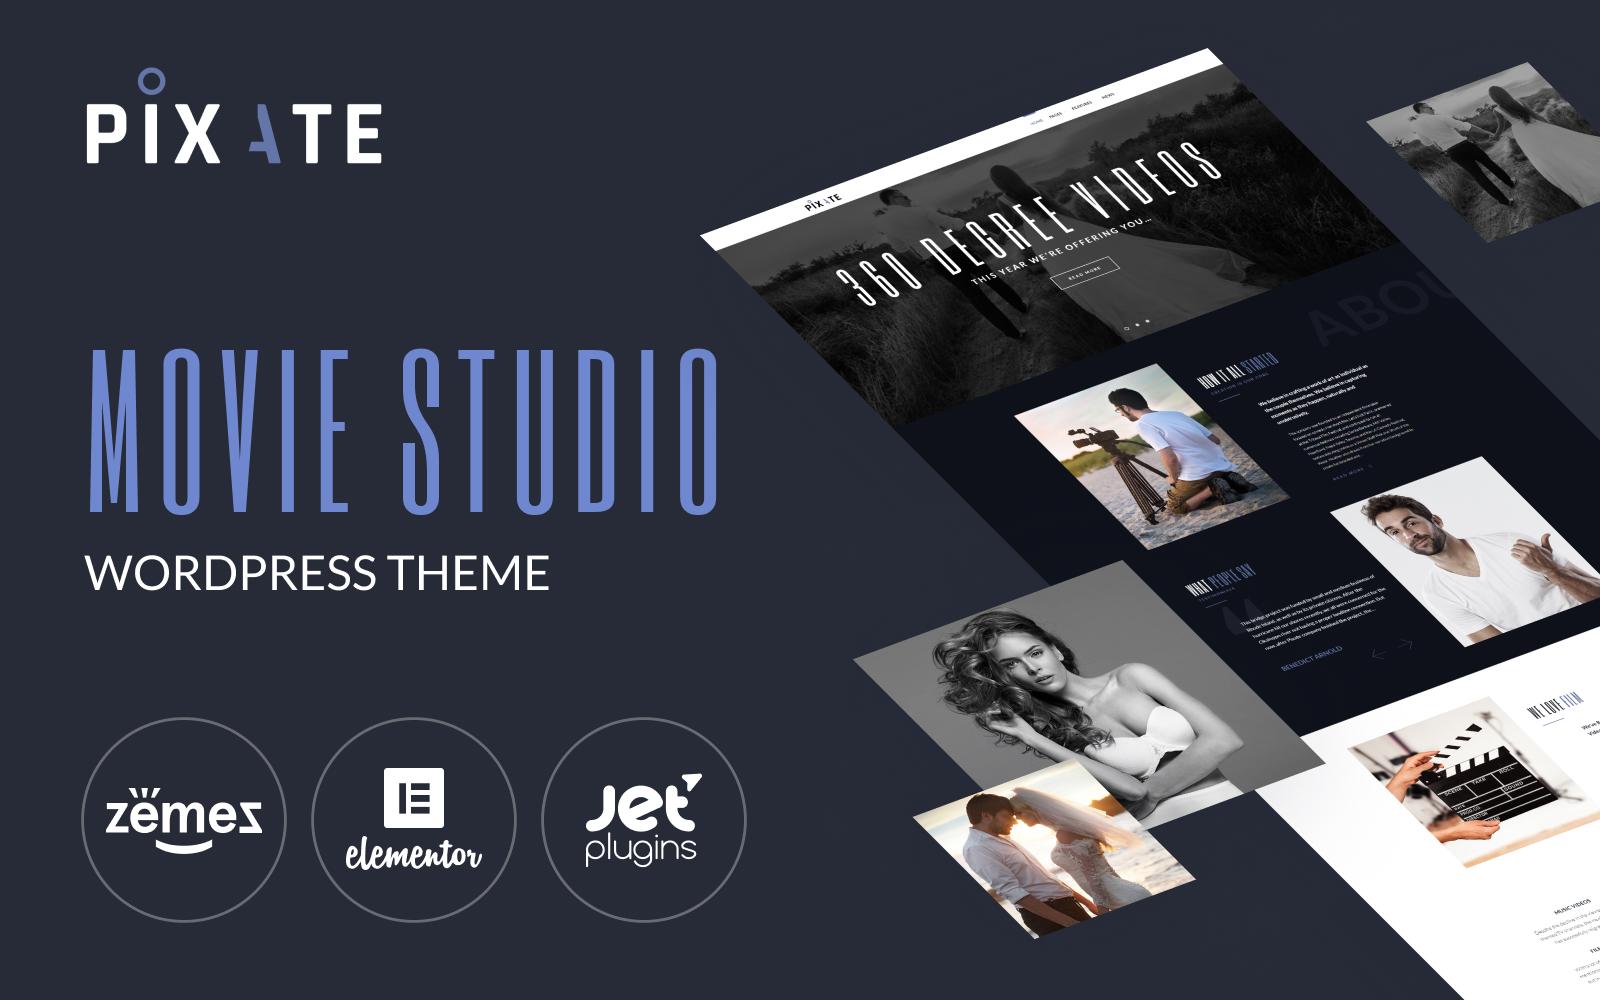 Responsivt Pixate - Movie Studio WordPress Theme WordPress-tema #65159